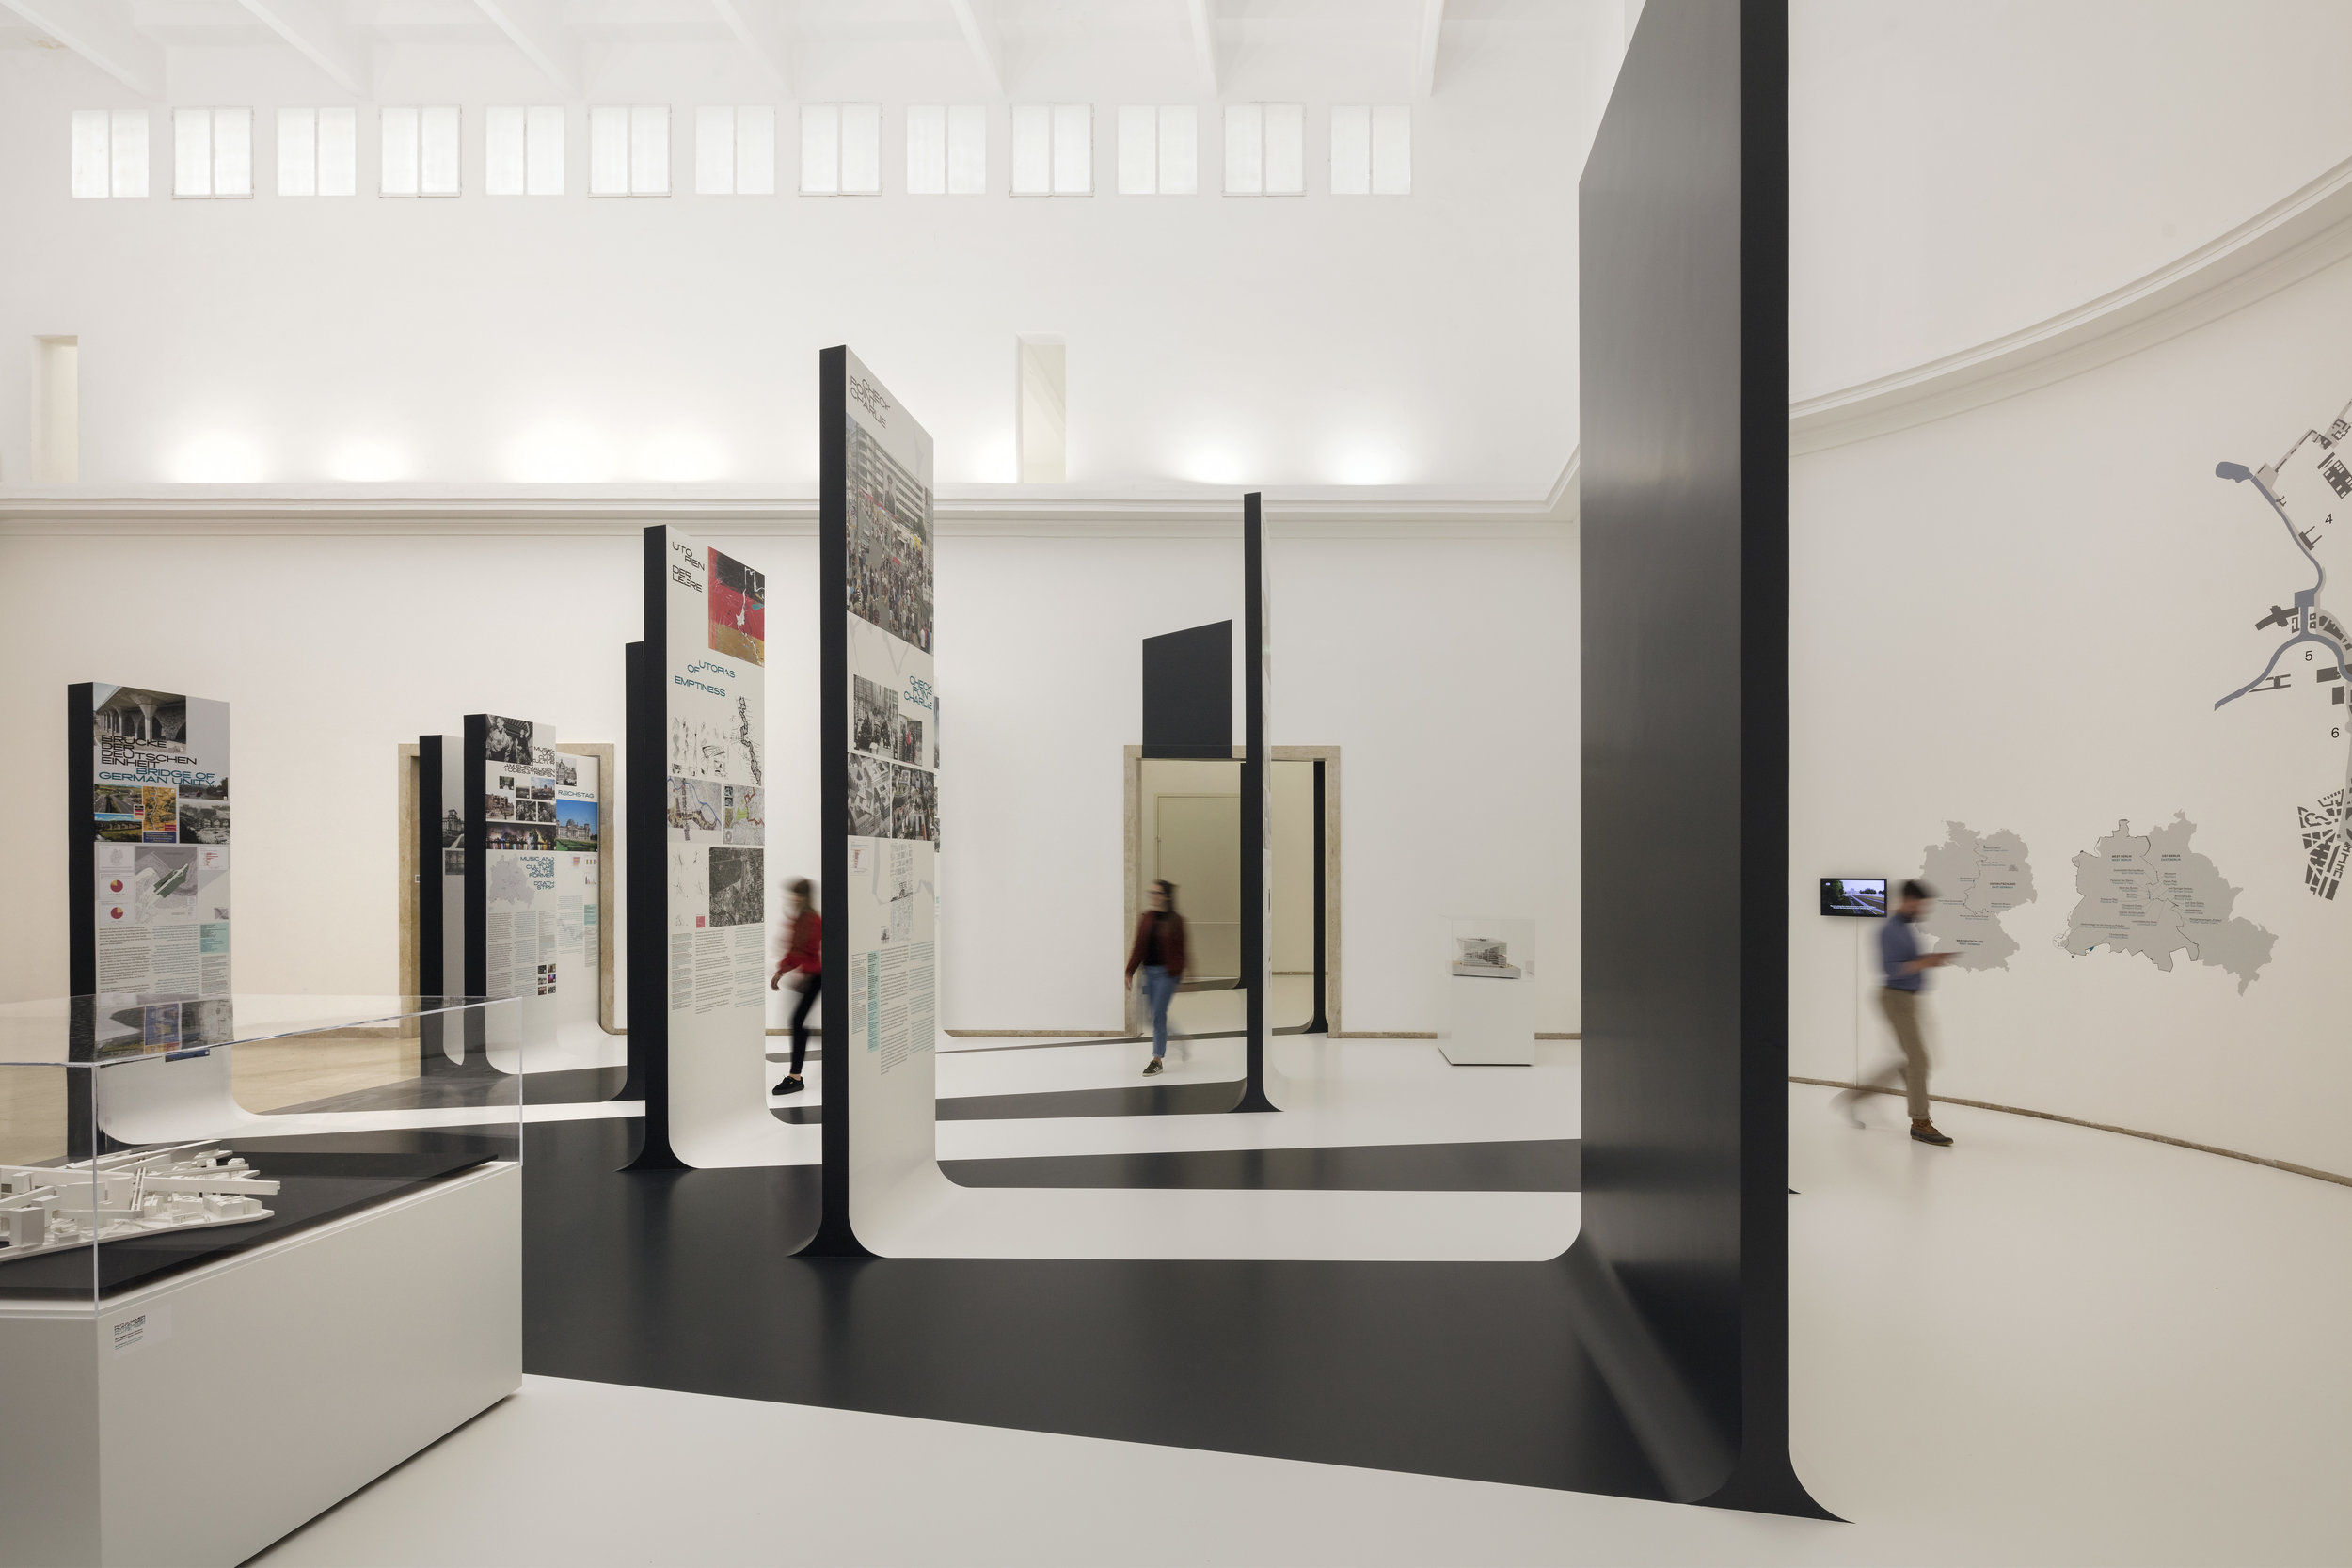 11_German Pavilion_Biennale Architettura 2018_c_Jan Bitter.jpg